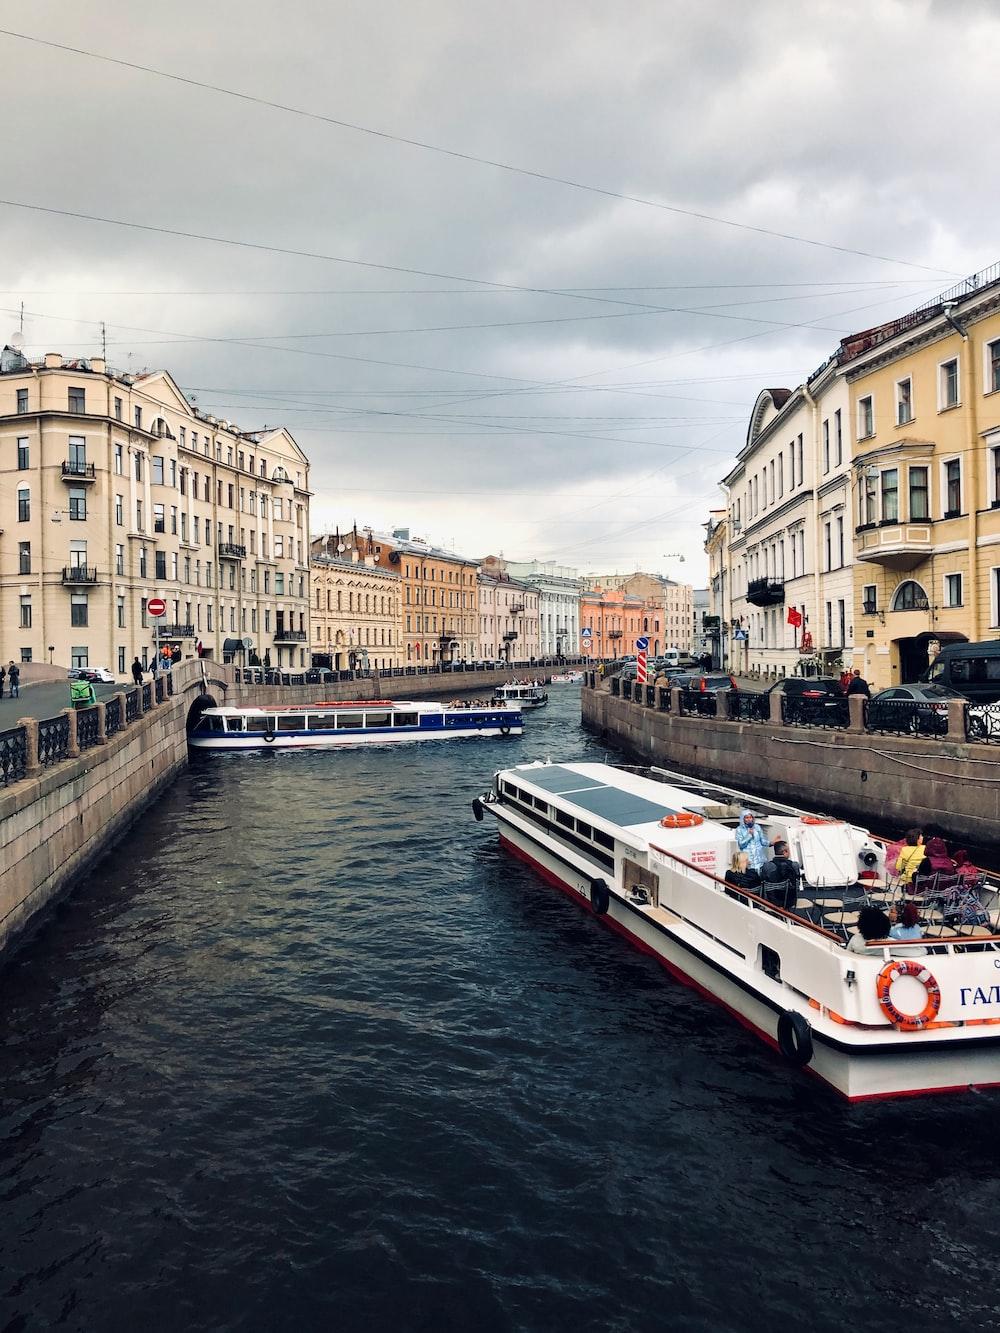 boat in body of water between buildings